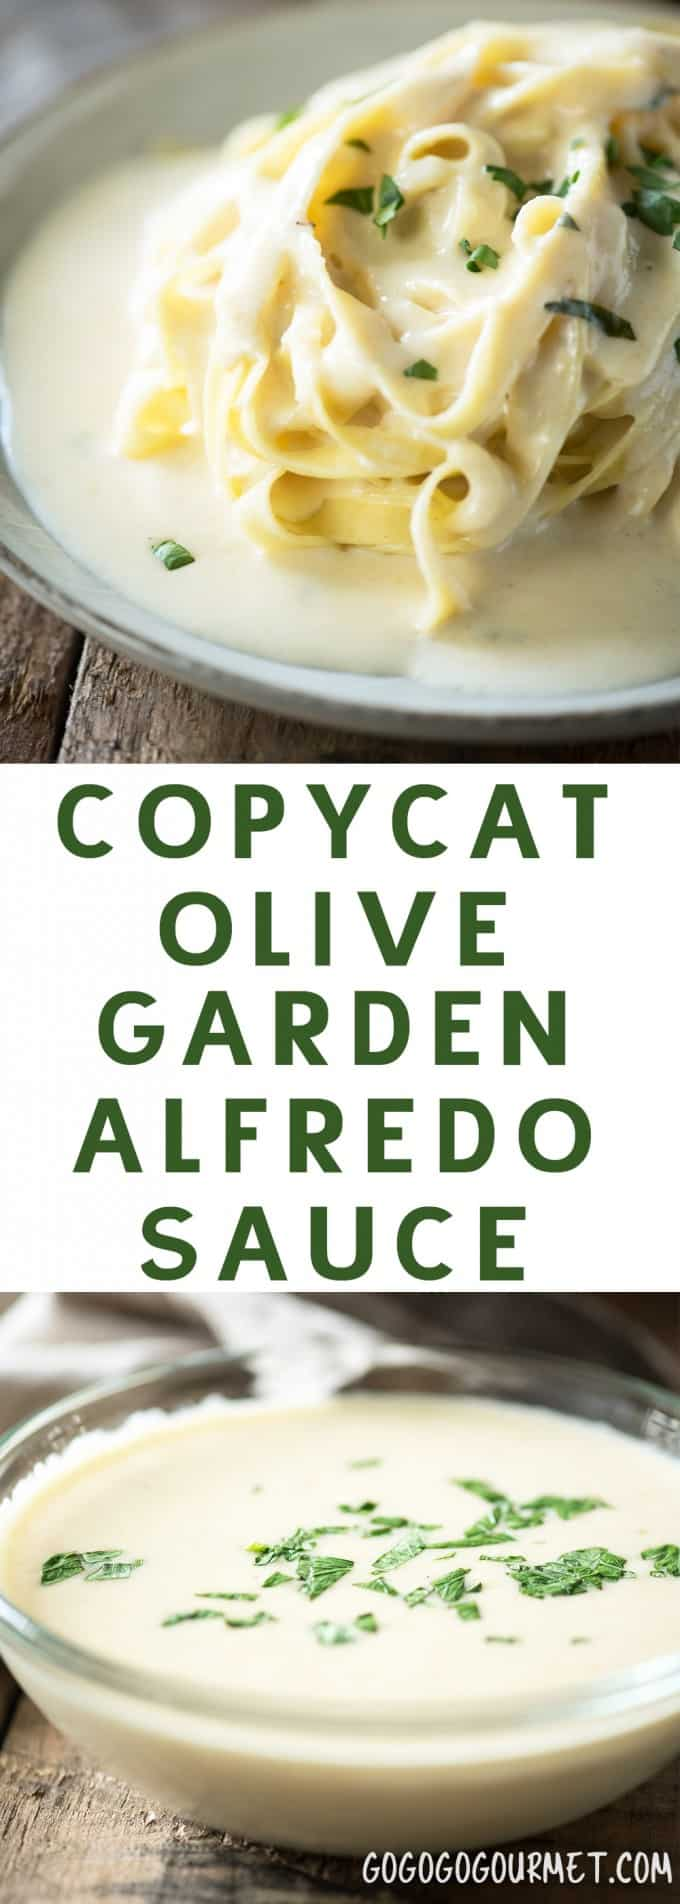 Copycat olive garden alfredo sauce go go go gourmet for Olive garden fettuccine alfredo recipe copycat